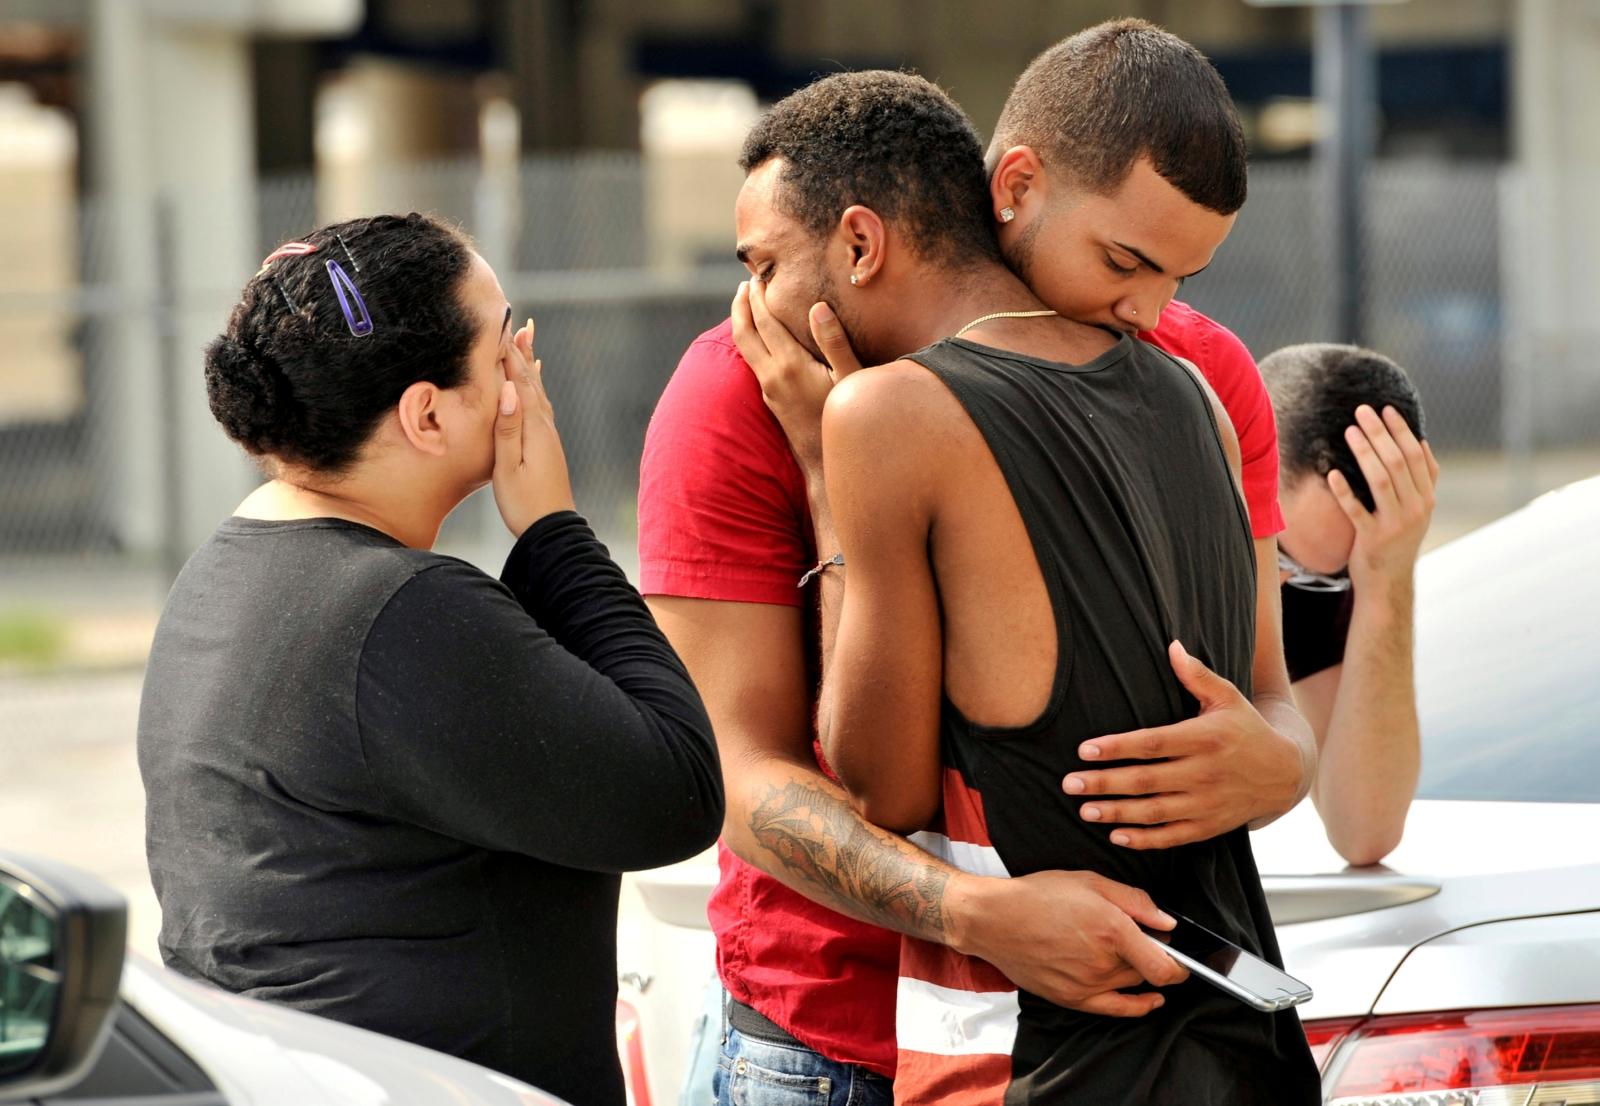 Orlando nightclub shooting: Afghan's president and former president condemn tragedy